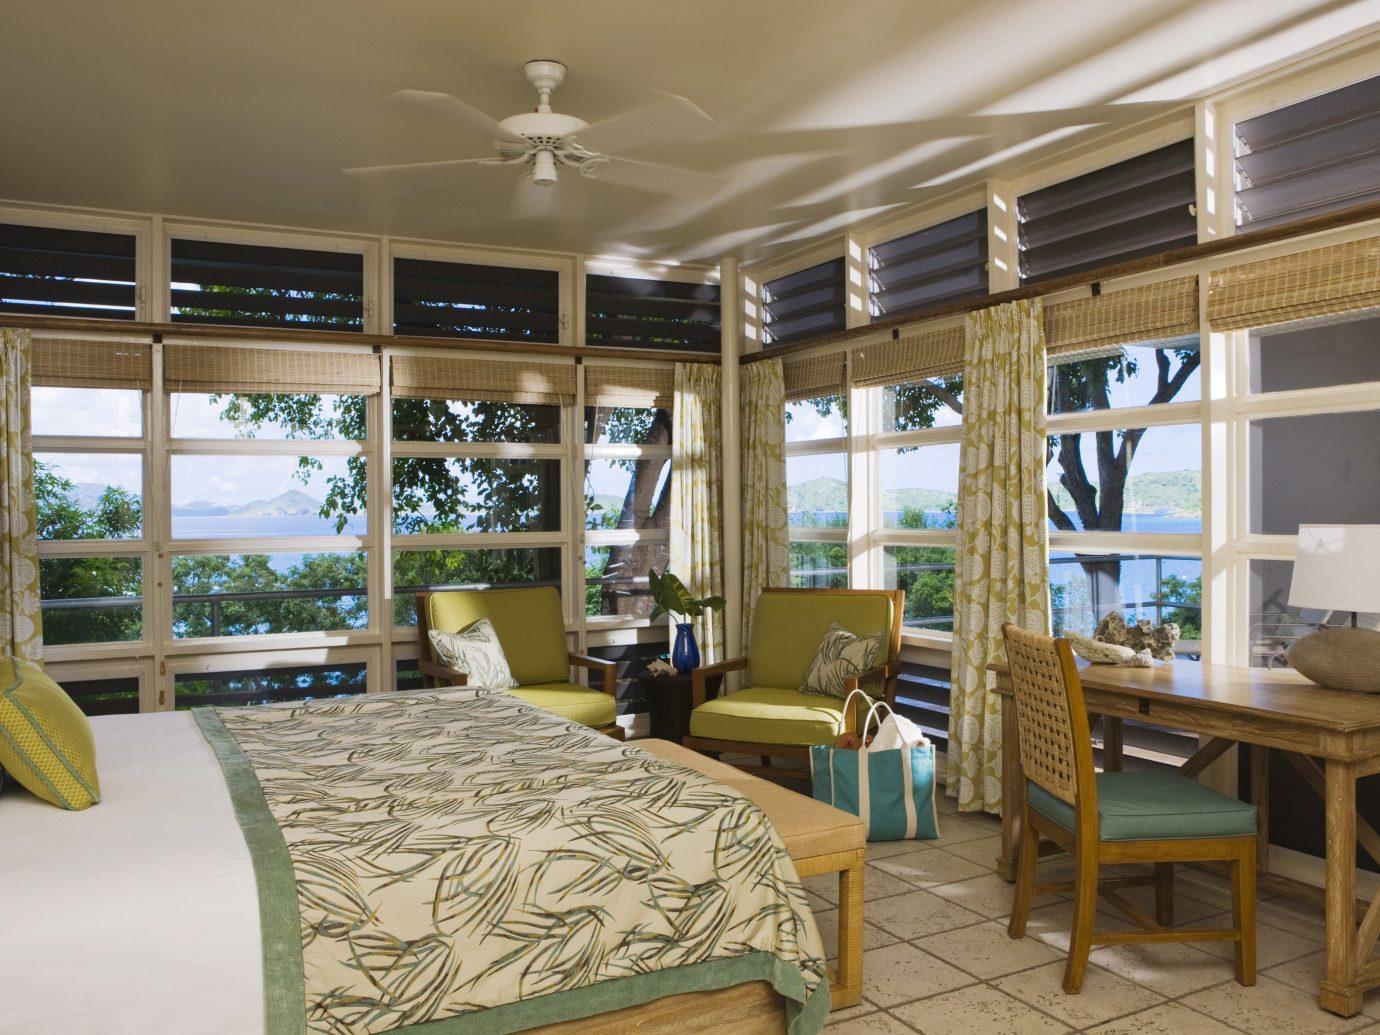 Bedroom Eco Family Luxury Resort Romantic Scenic views Suite Tropical property condominium living room home cottage